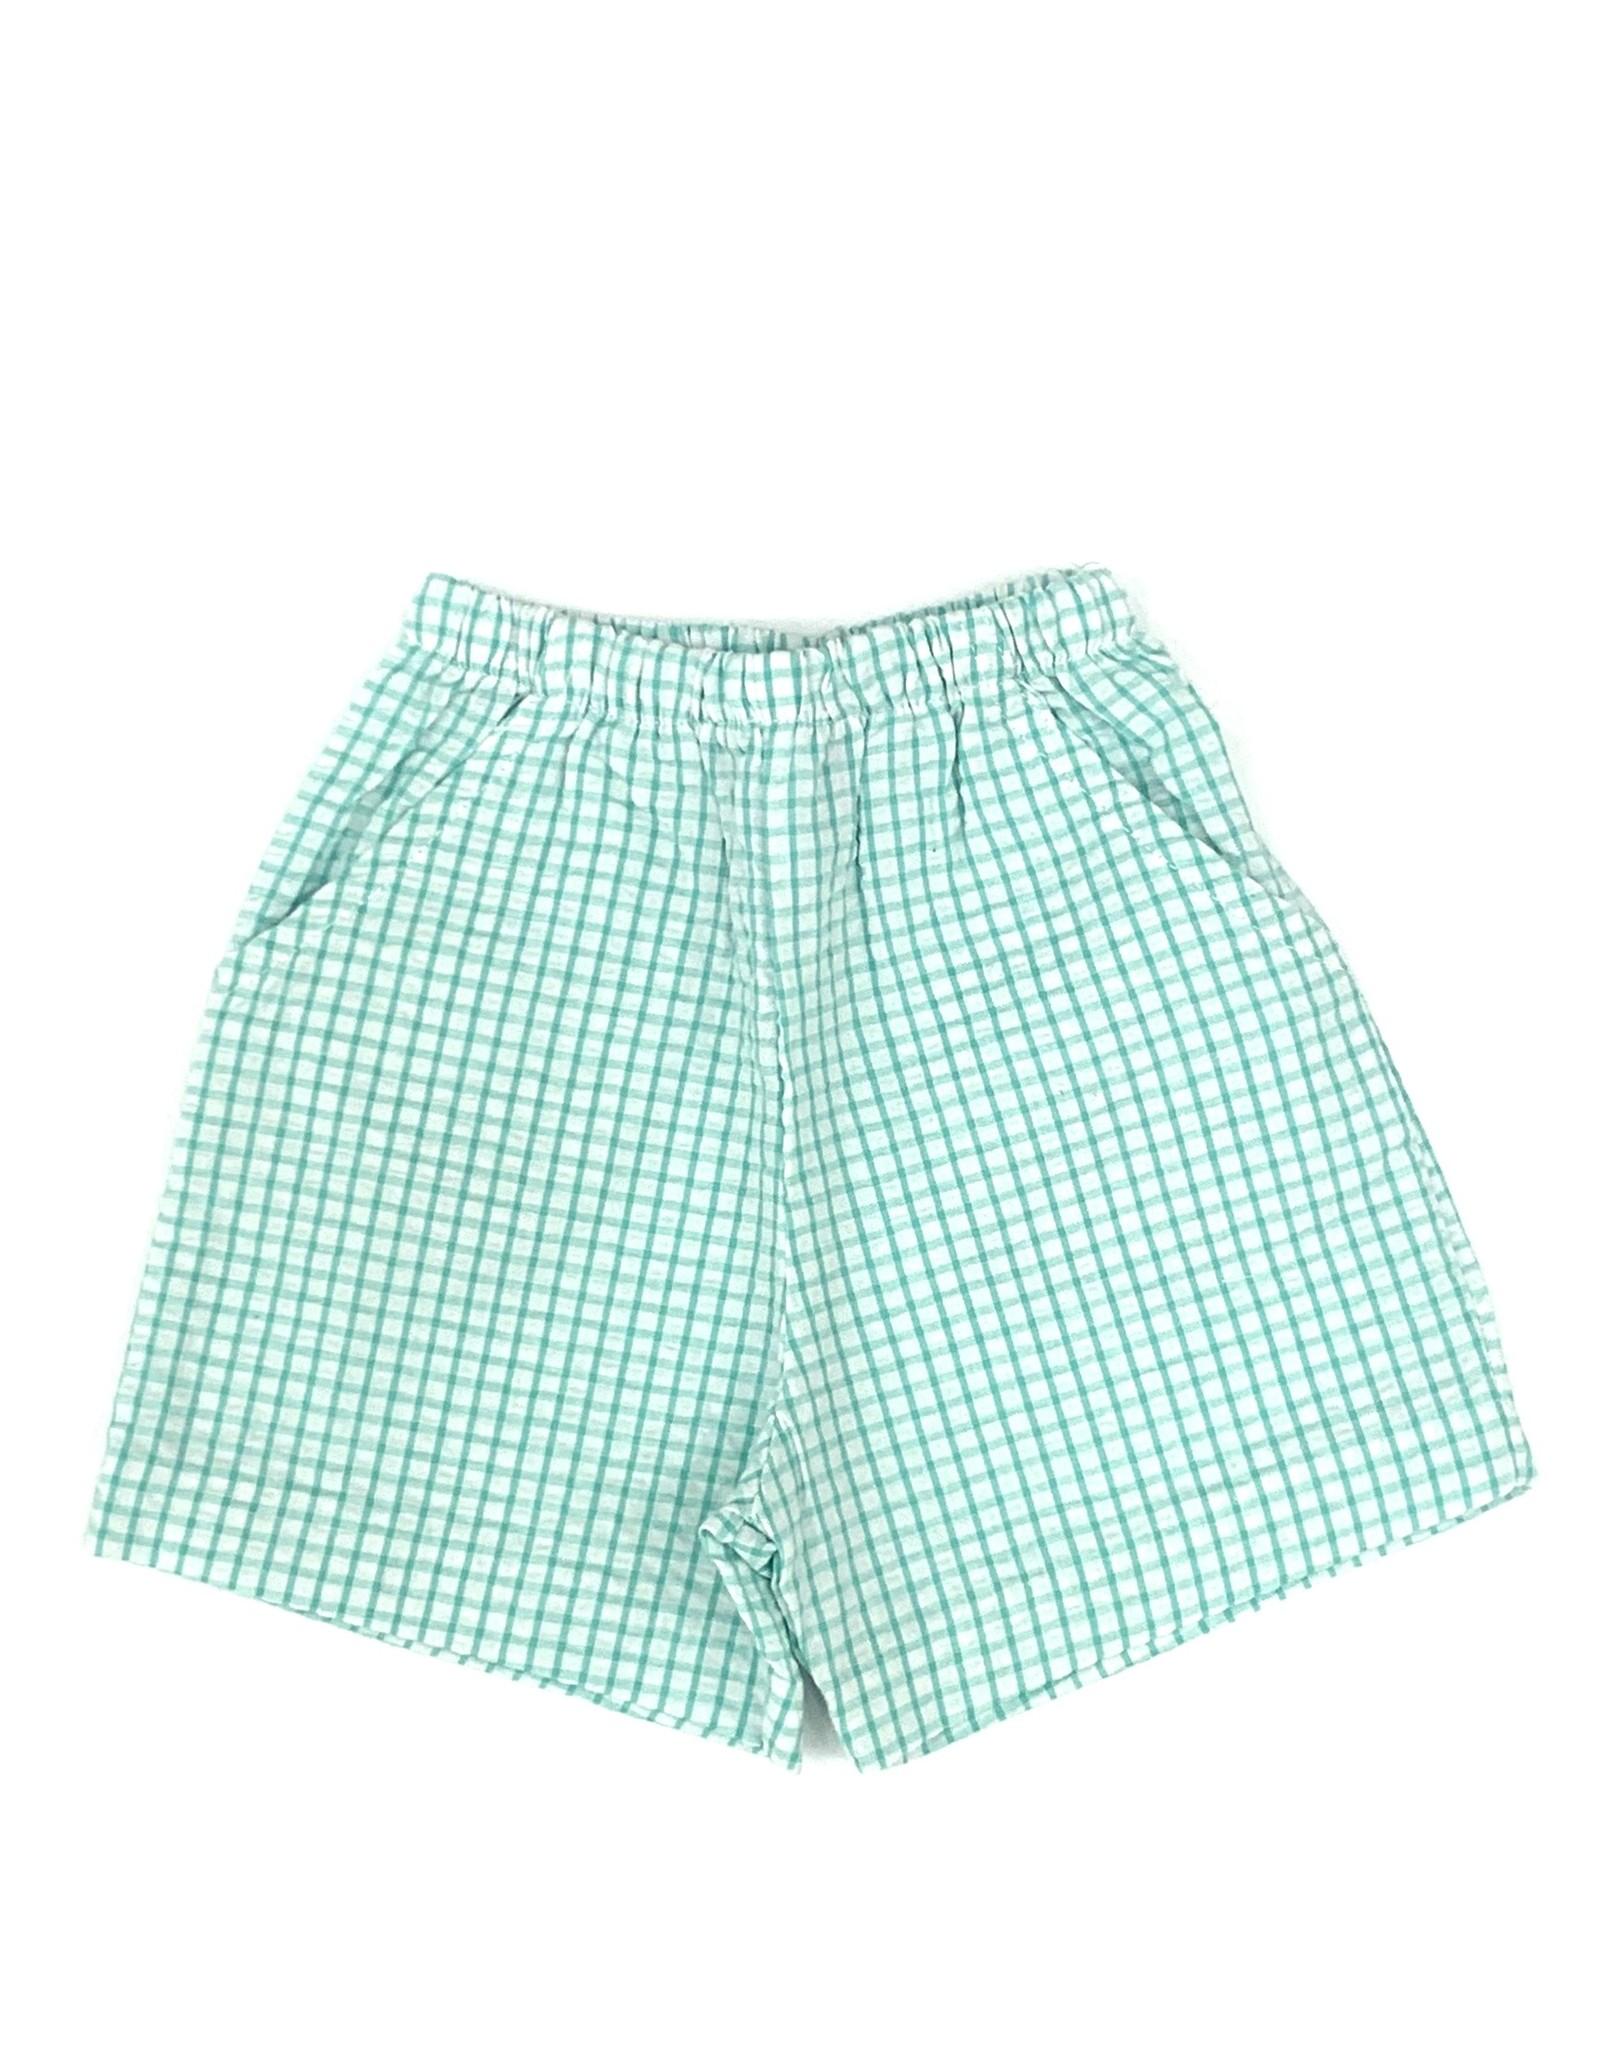 The Bailey Boys Palm Green Windowpane Elastic Waist Short